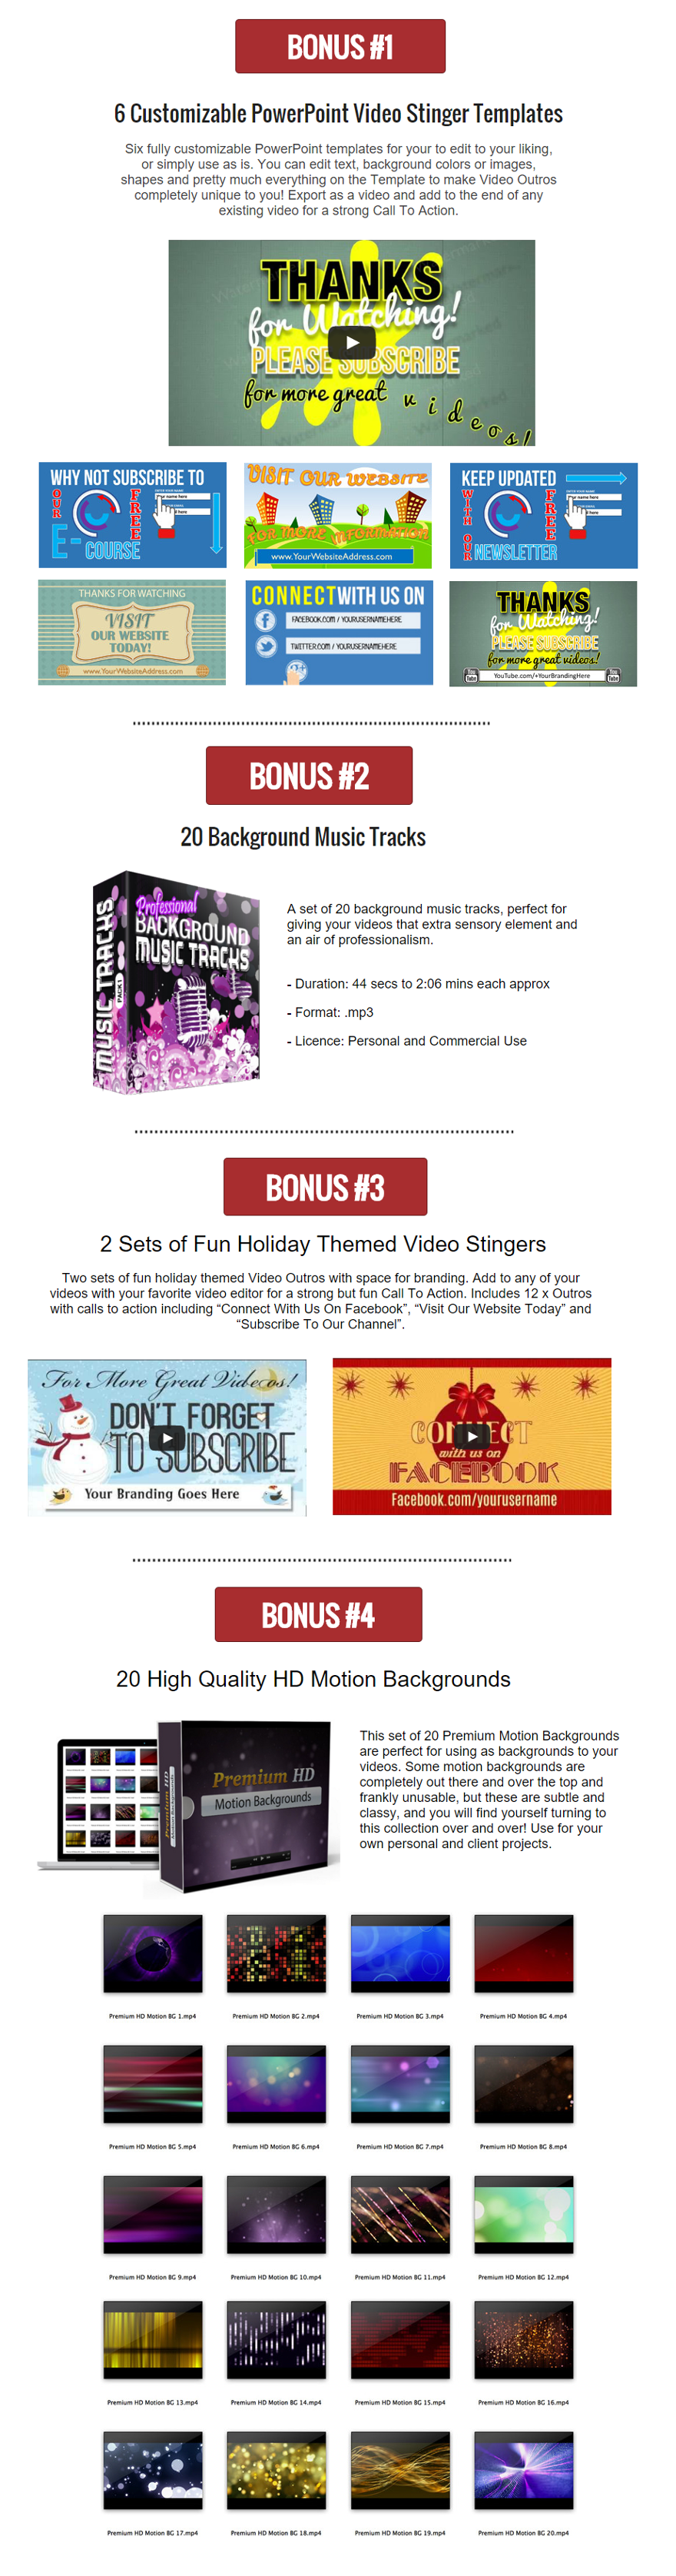 VidStickers Bonuses